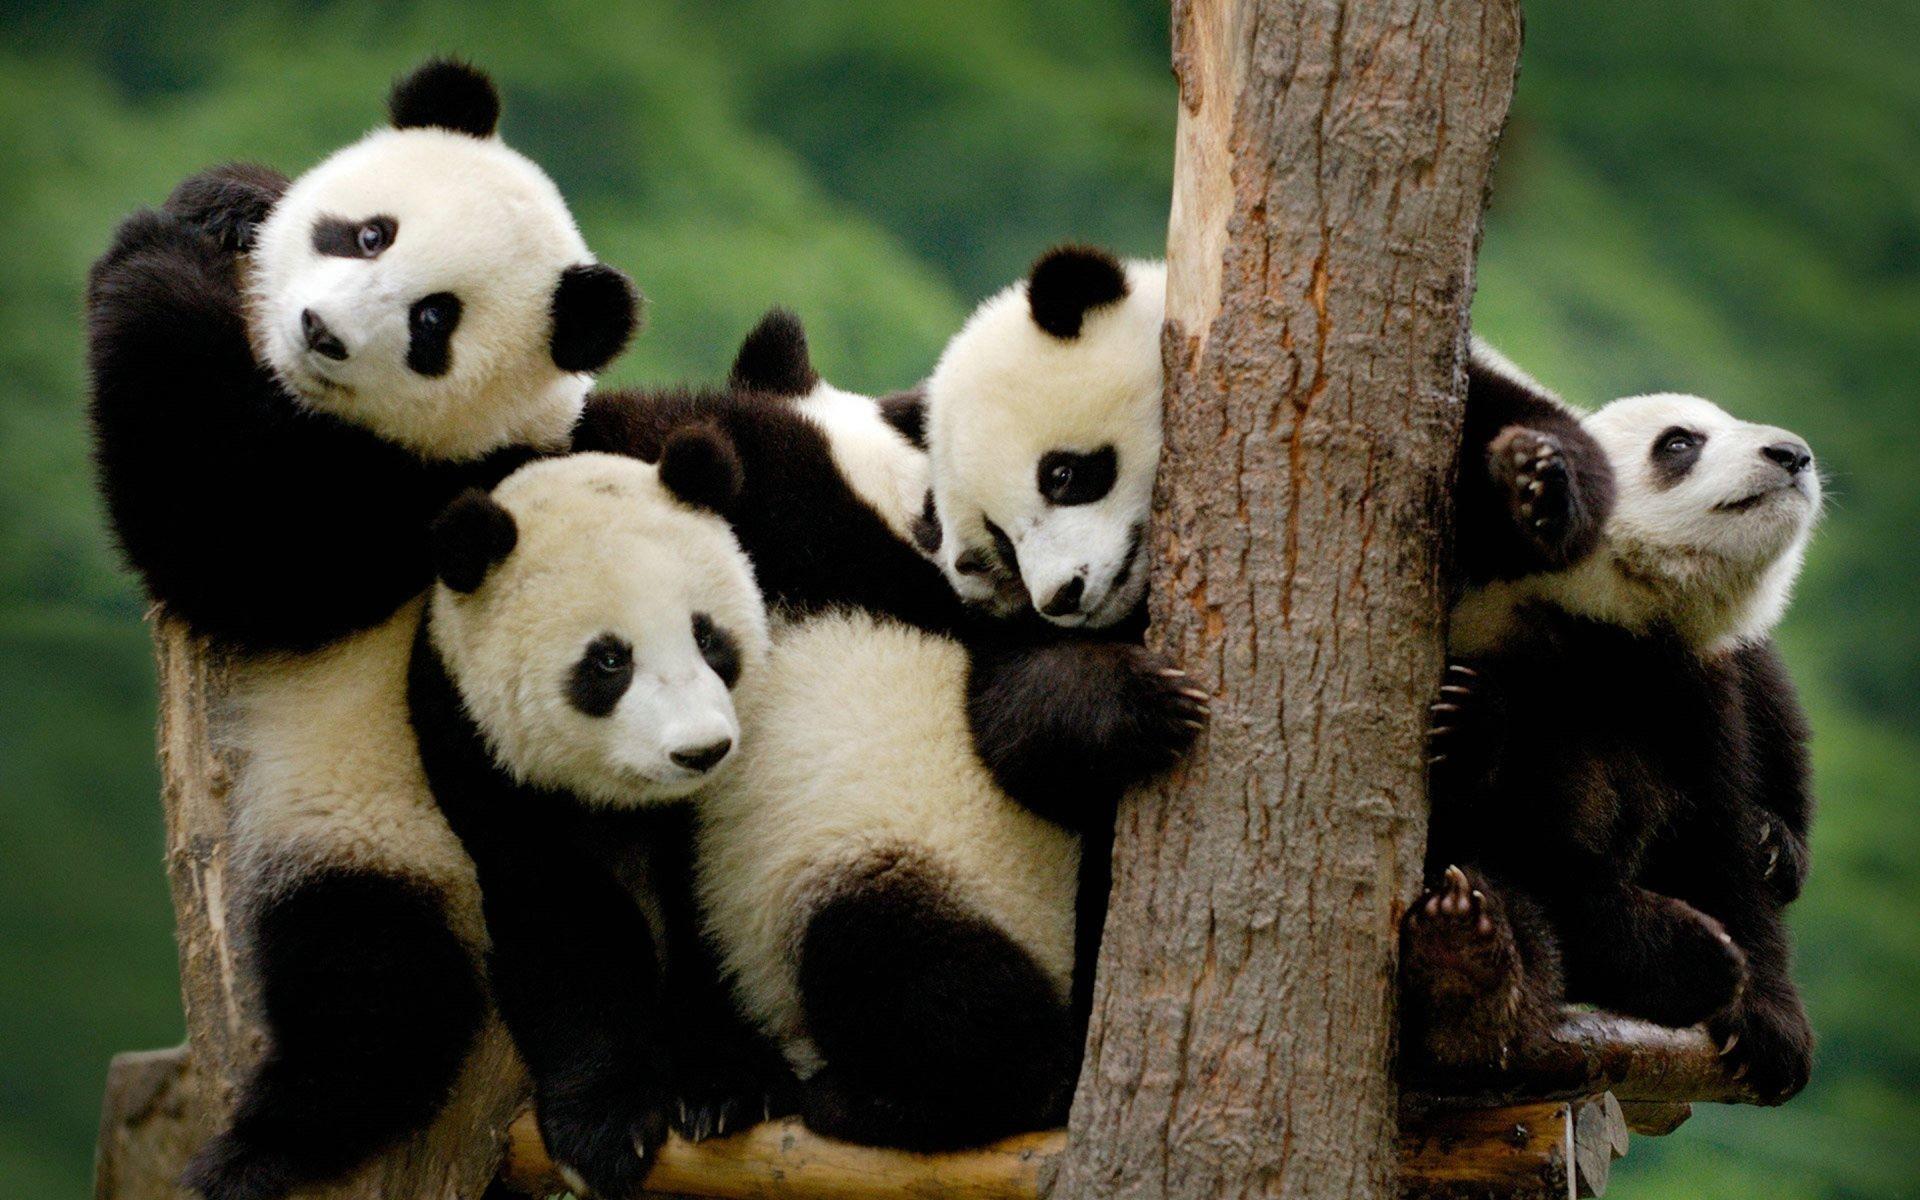 Panda bear wallpaper 64 images for Adorable wallpapers